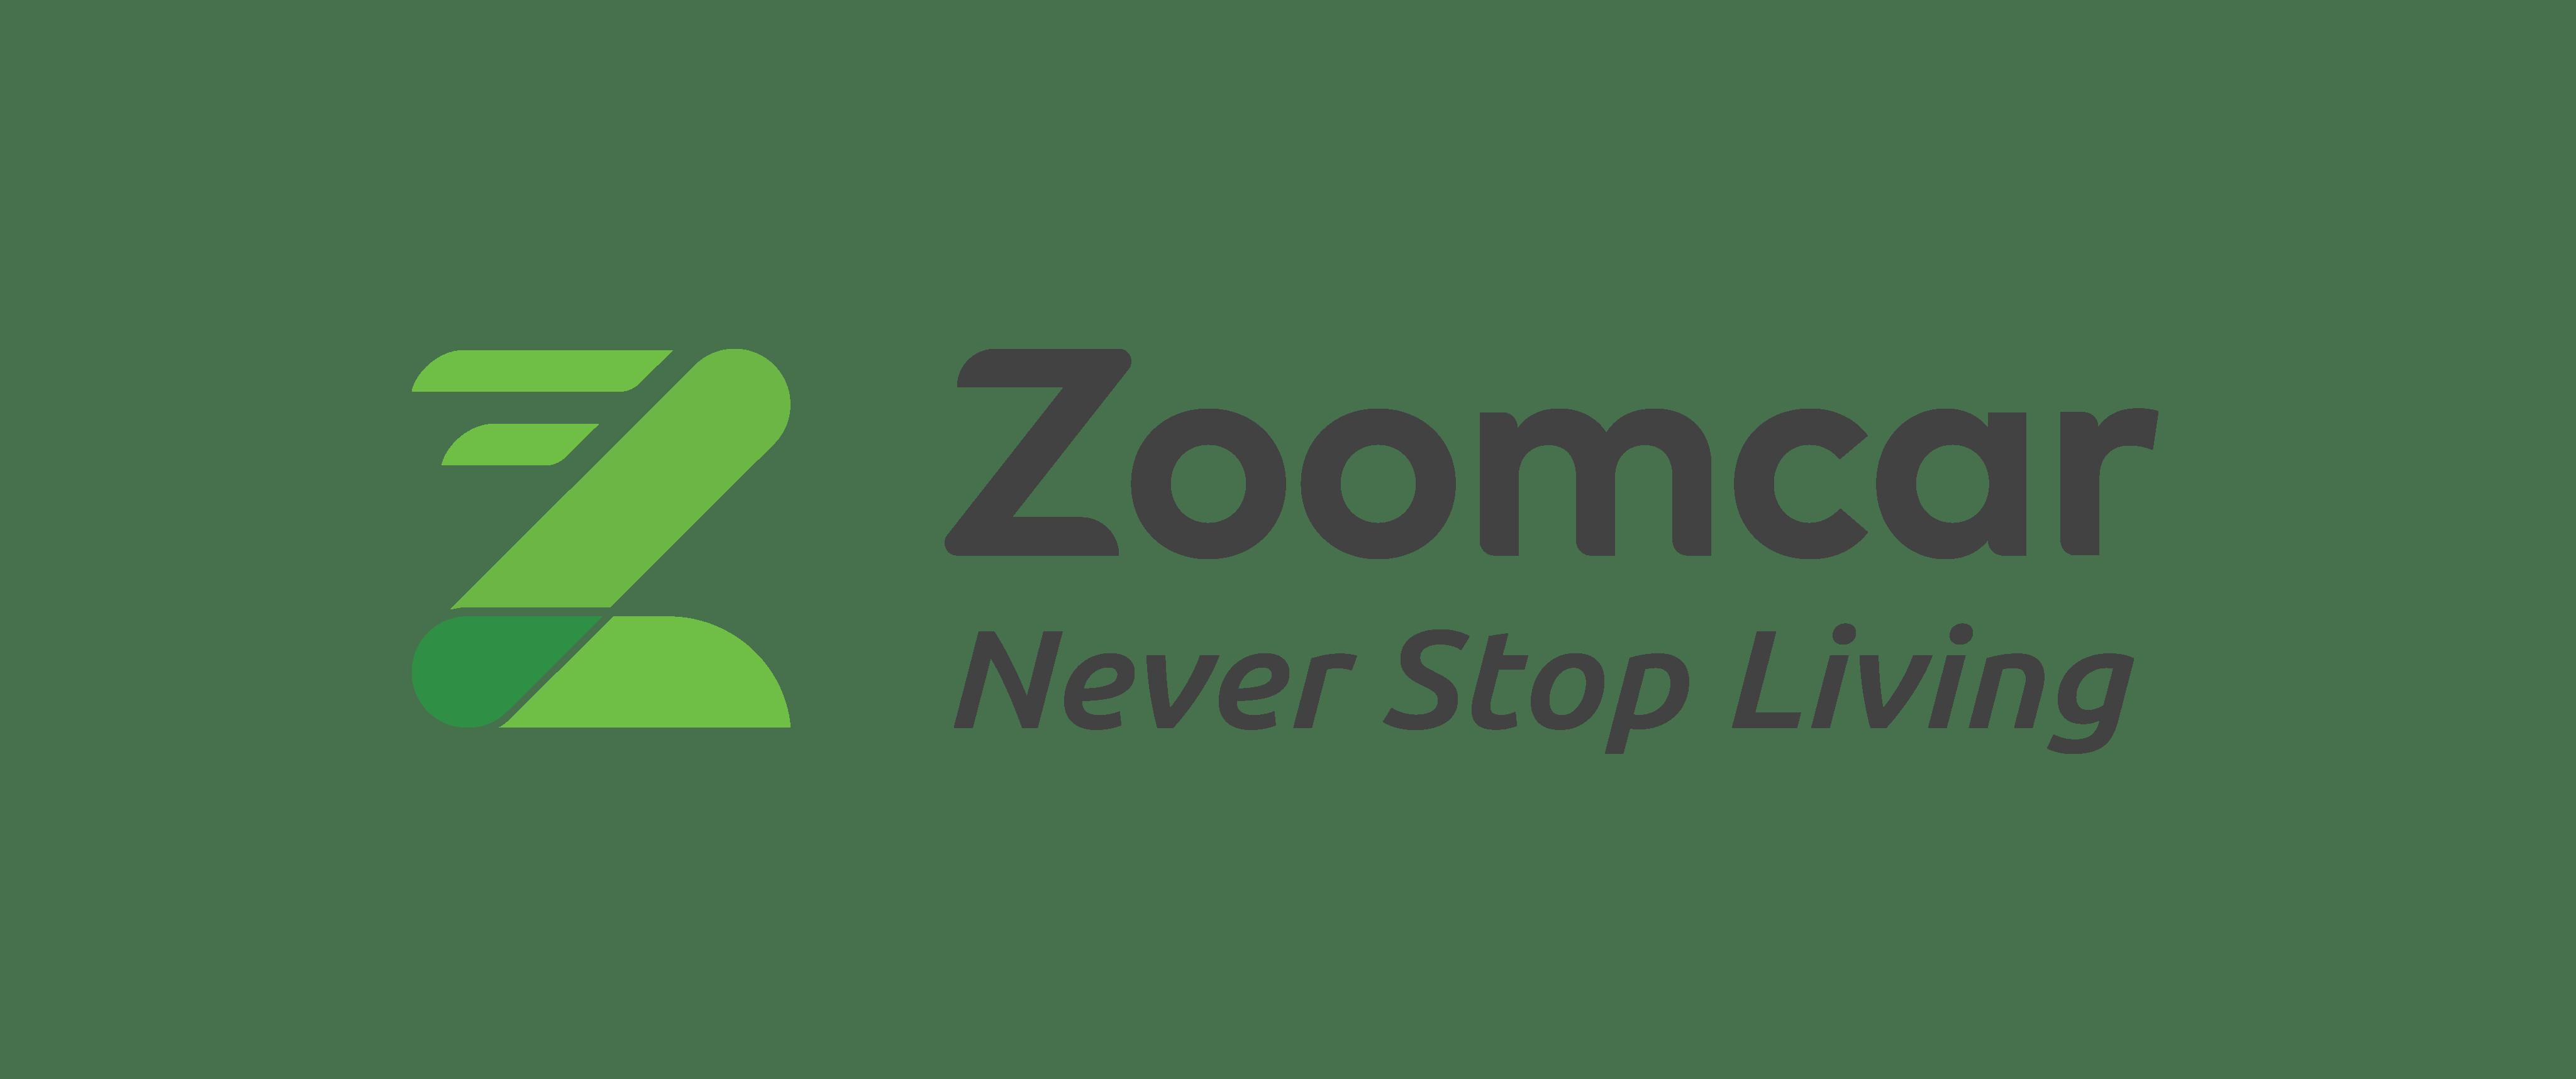 Zoom Car Customer Care Customer Care Raising Capital Self Driving